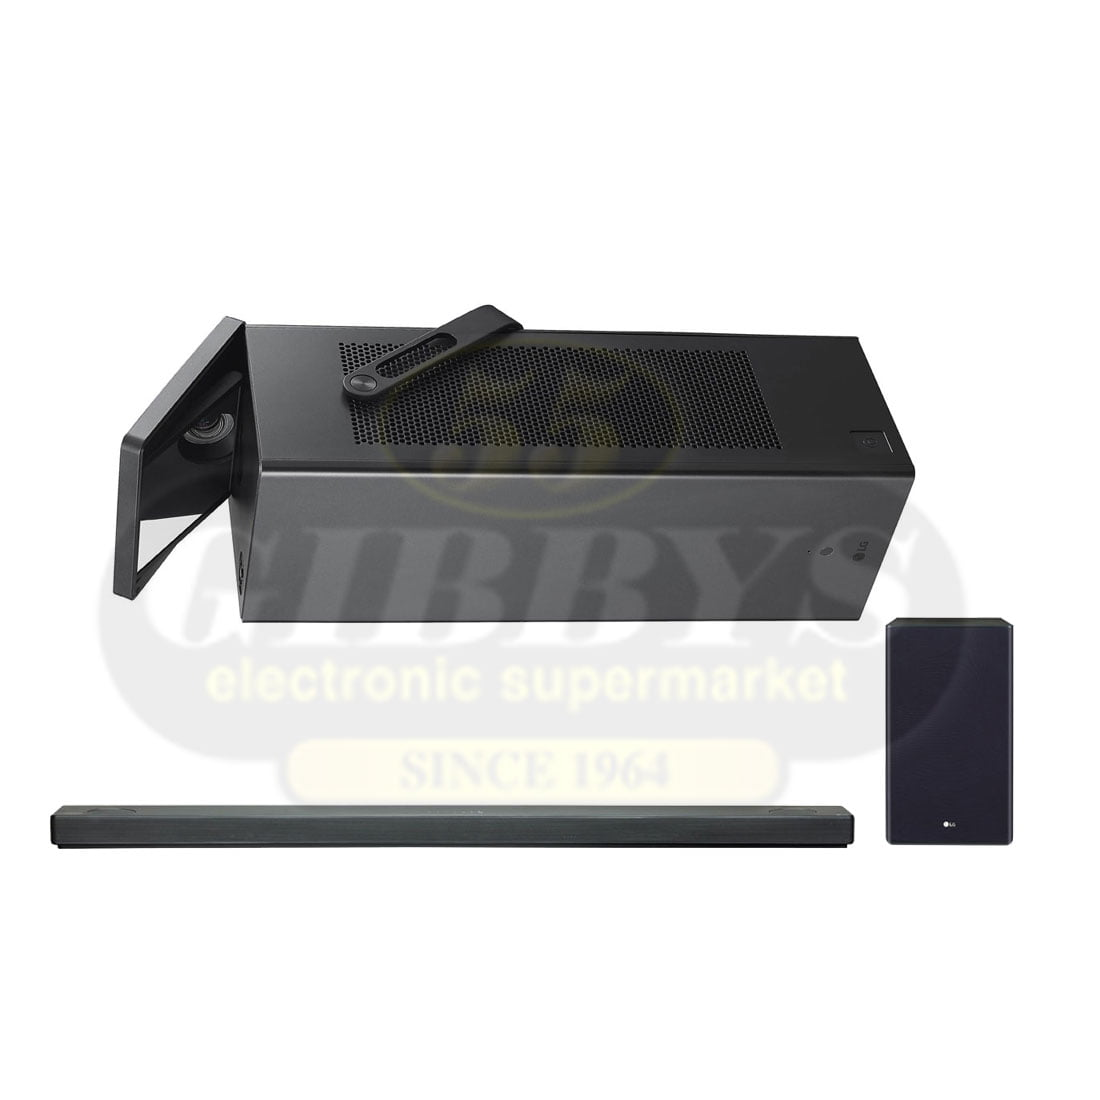 LG HU80KA 4K UHD Laser CineBeam Projector | SL10YG Soundbar